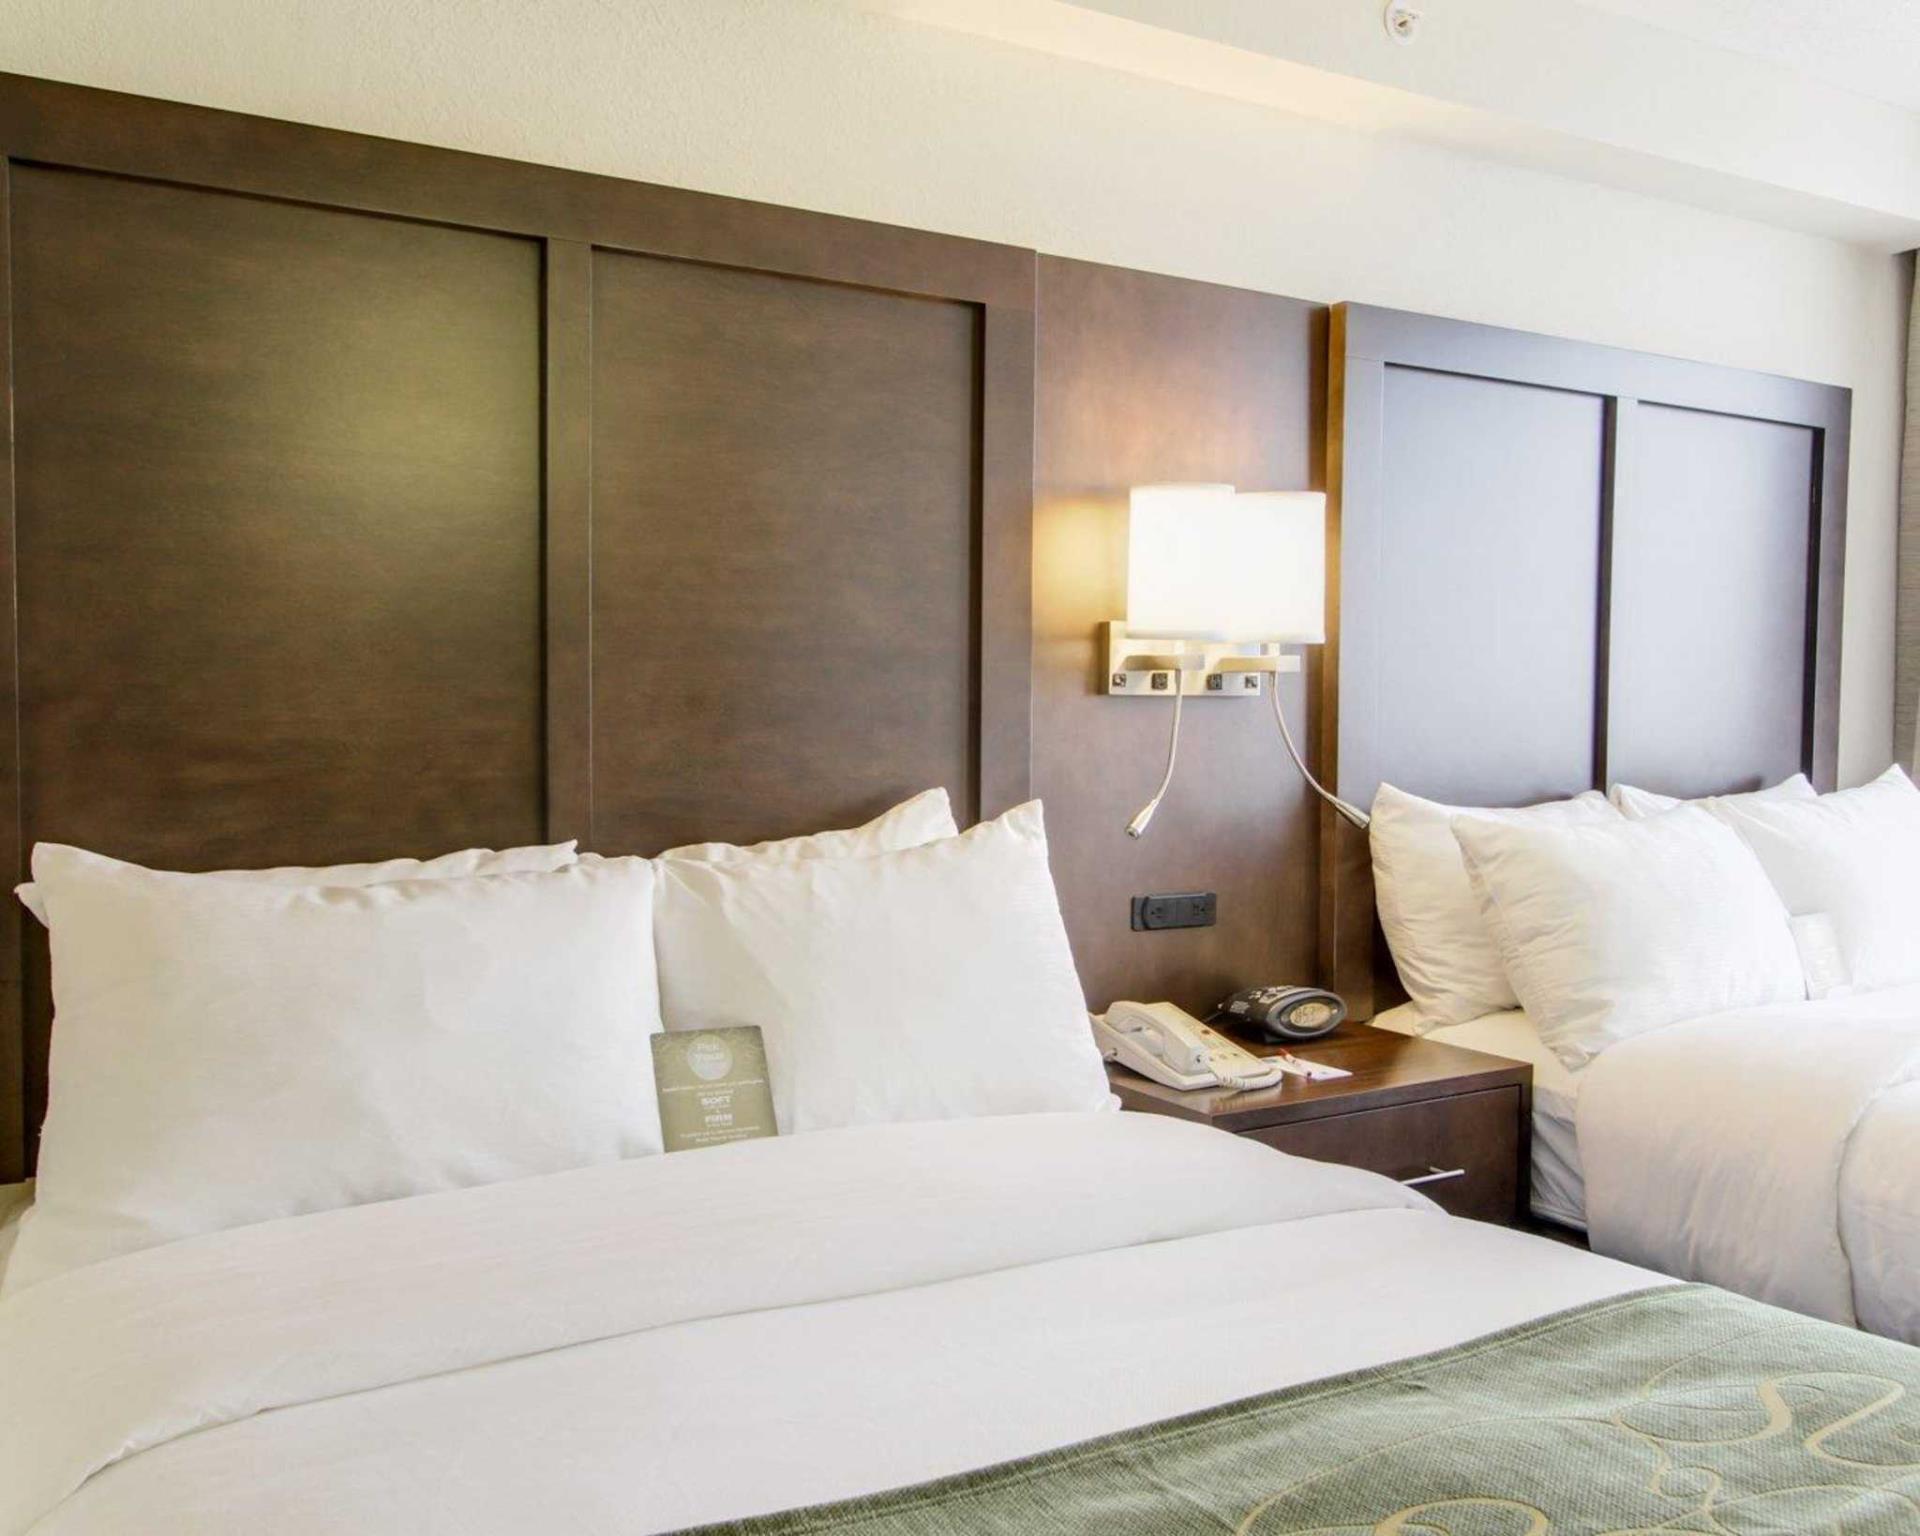 das comfort suites weston sawgrass mills south in fort lauderdale fl buchen. Black Bedroom Furniture Sets. Home Design Ideas